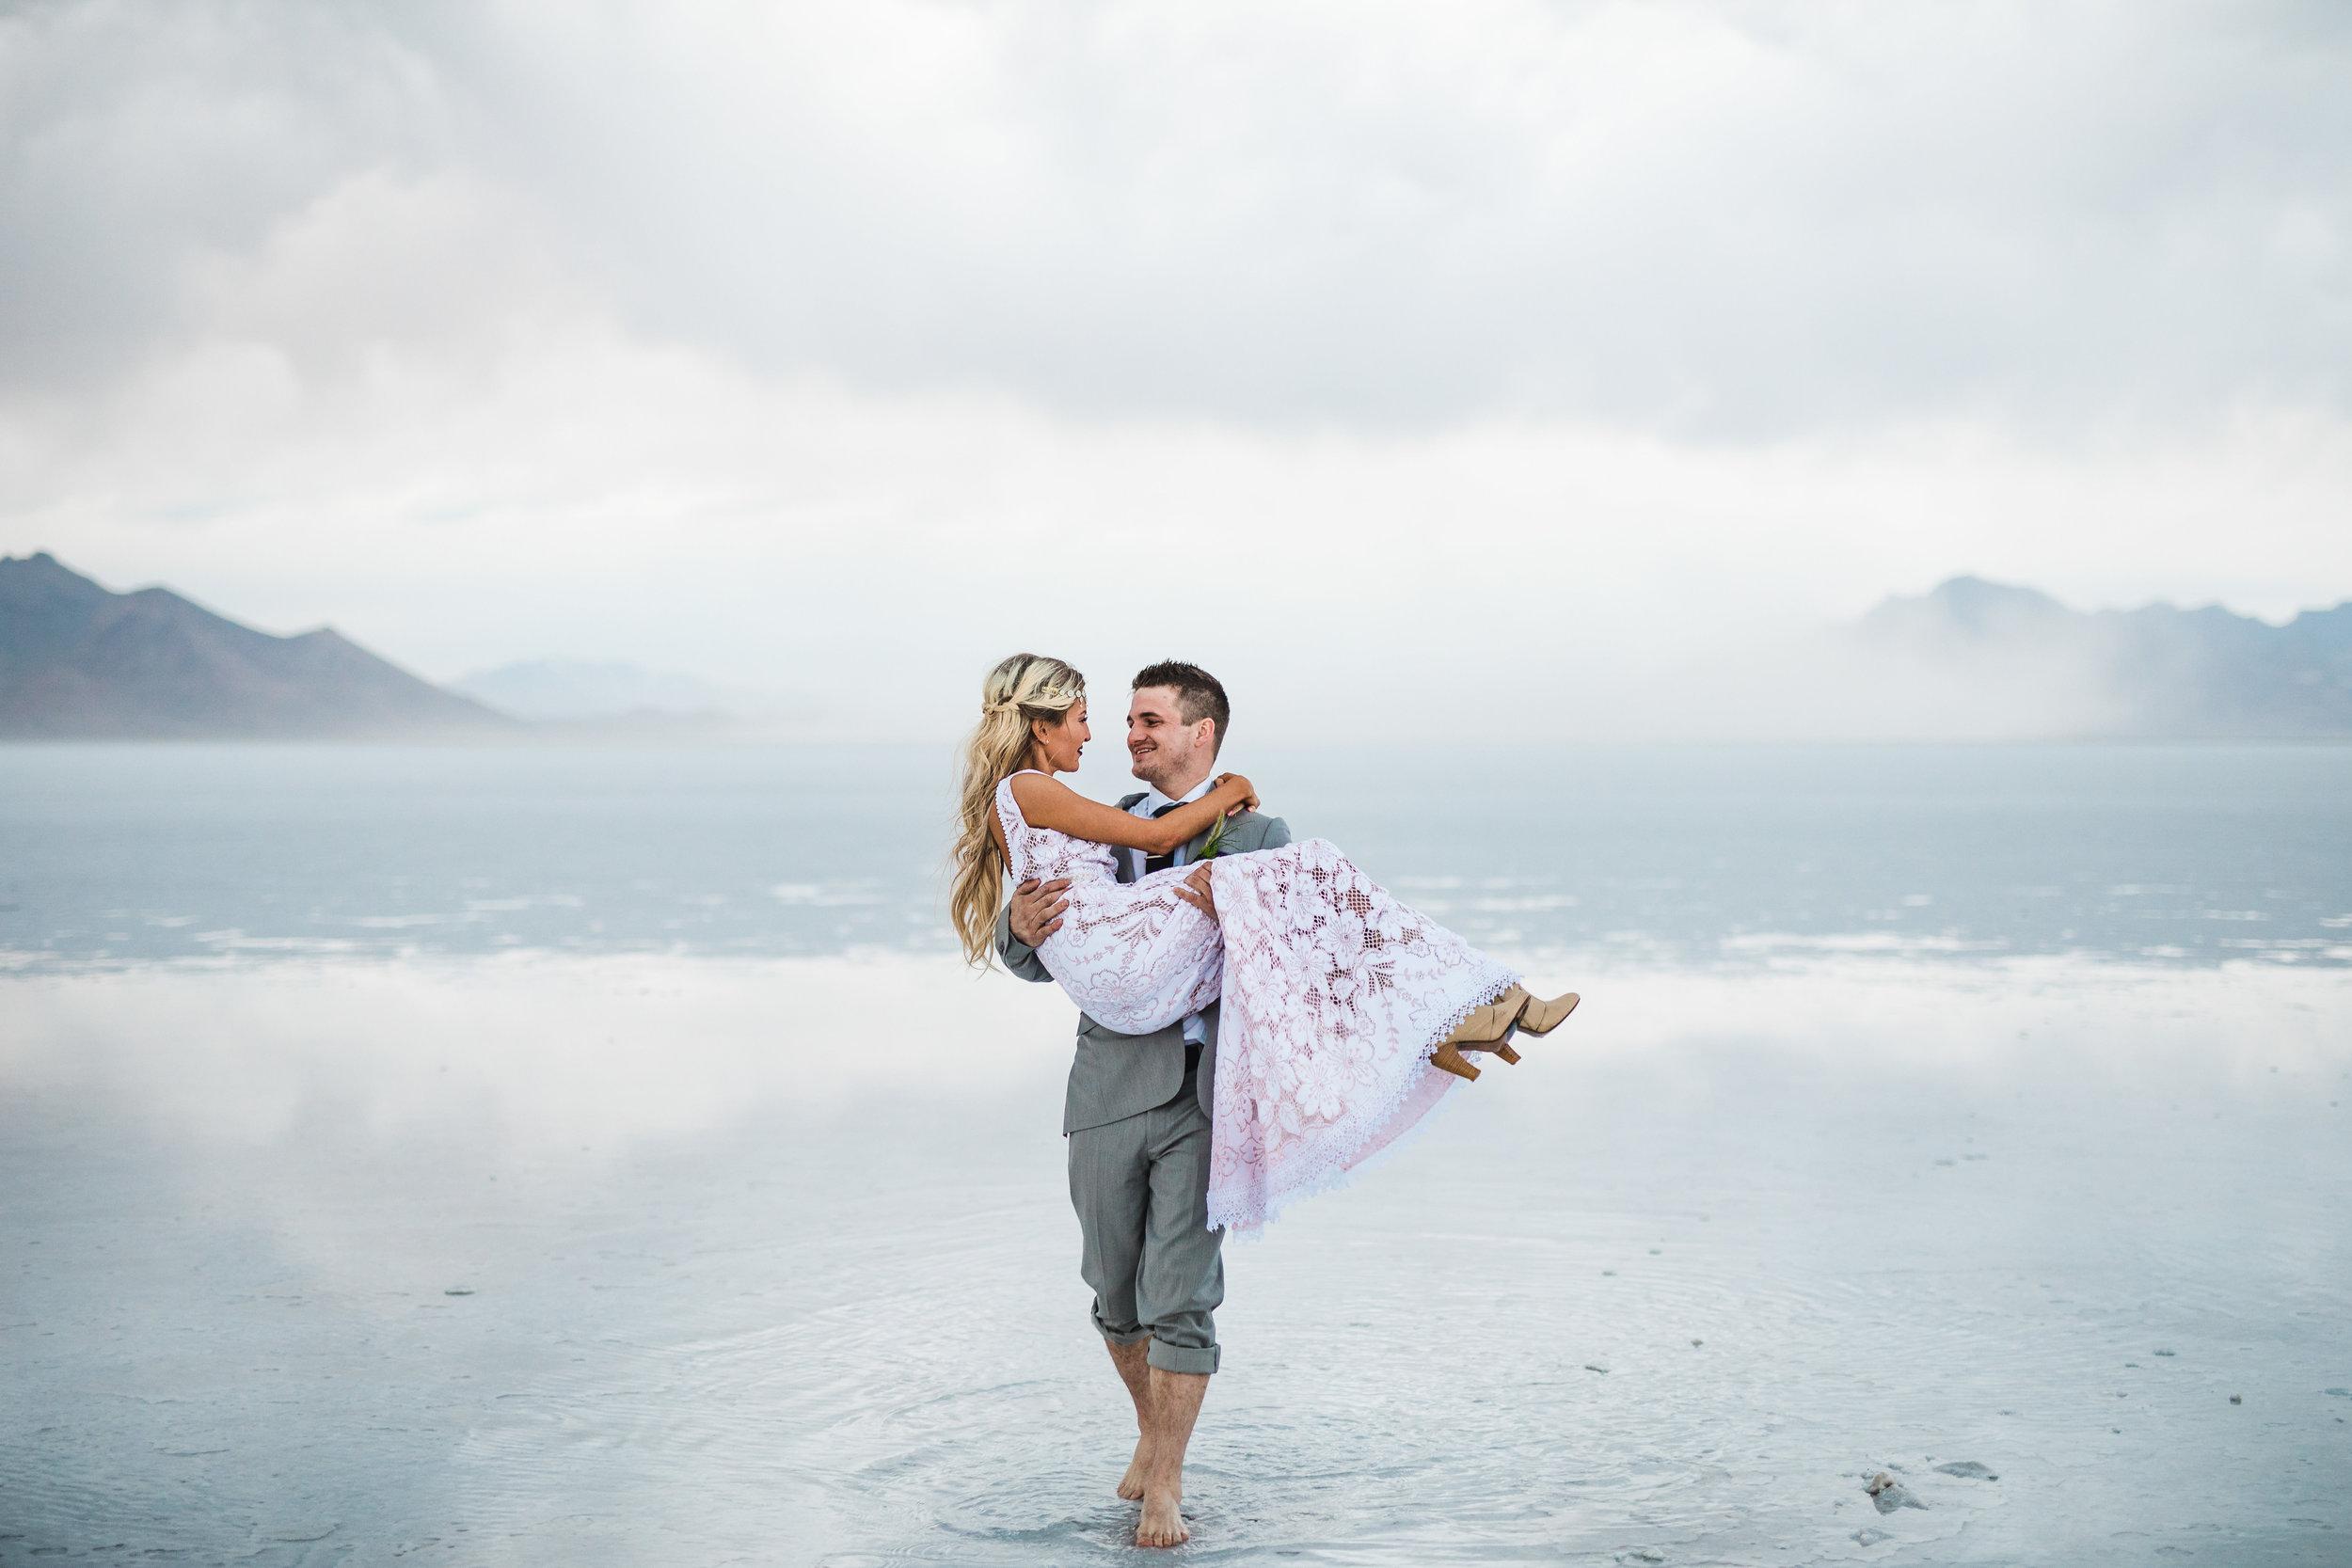 Bride and groom walking across the water unique wedding pictures Bonneville Salt Flats